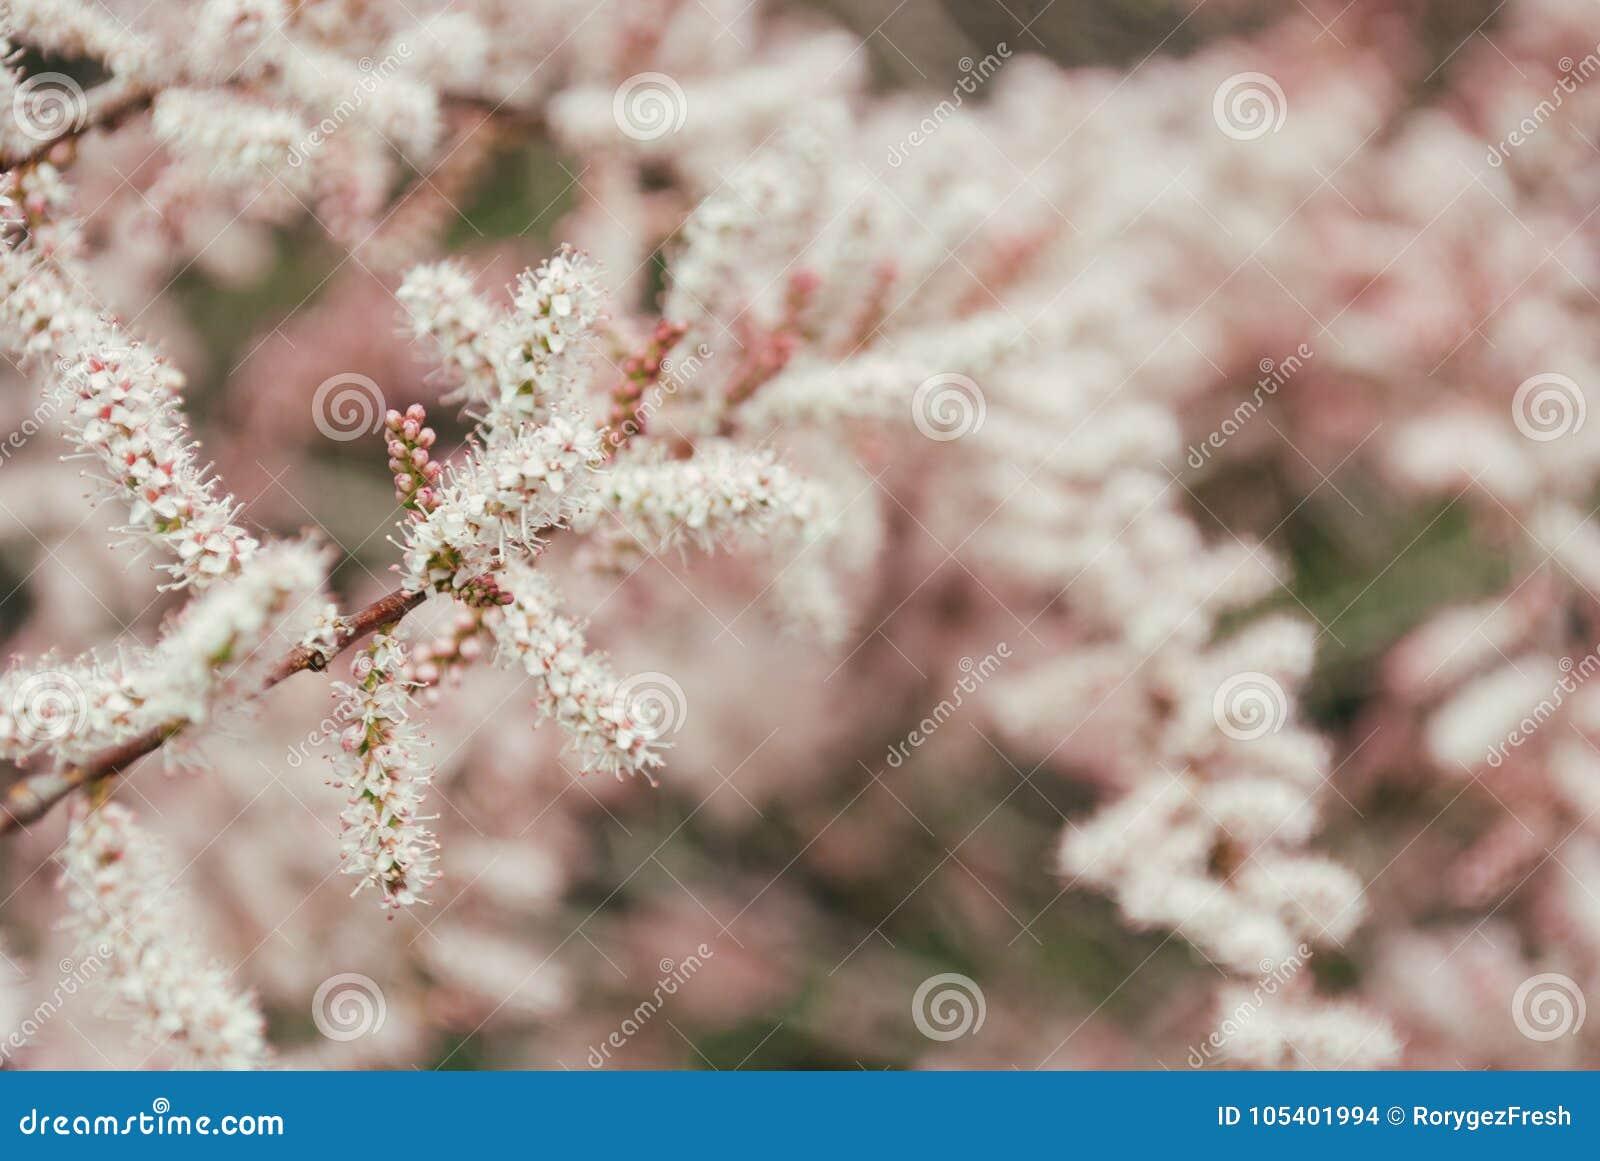 Download Δέντρο με τα λουλούδια του Tamarisk Στοκ Εικόνες - εικόνα από bloodsuckers, floral: 105401994